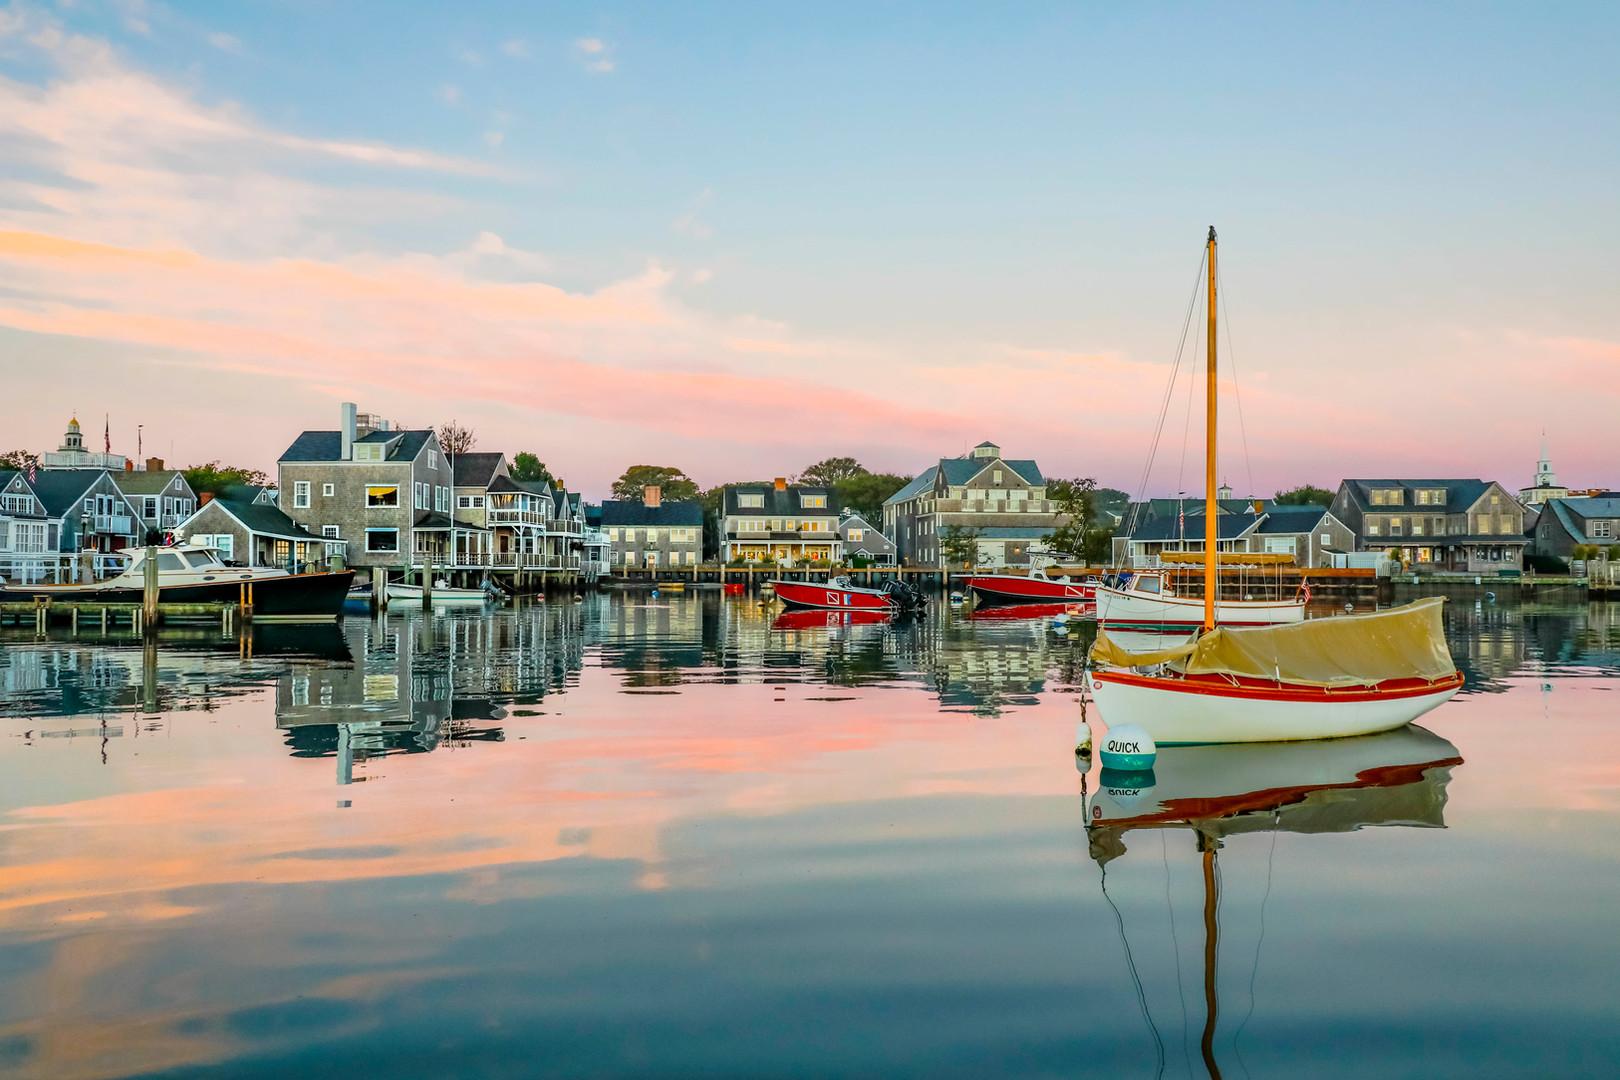 Colorful Nantucket Boats at Sunrise